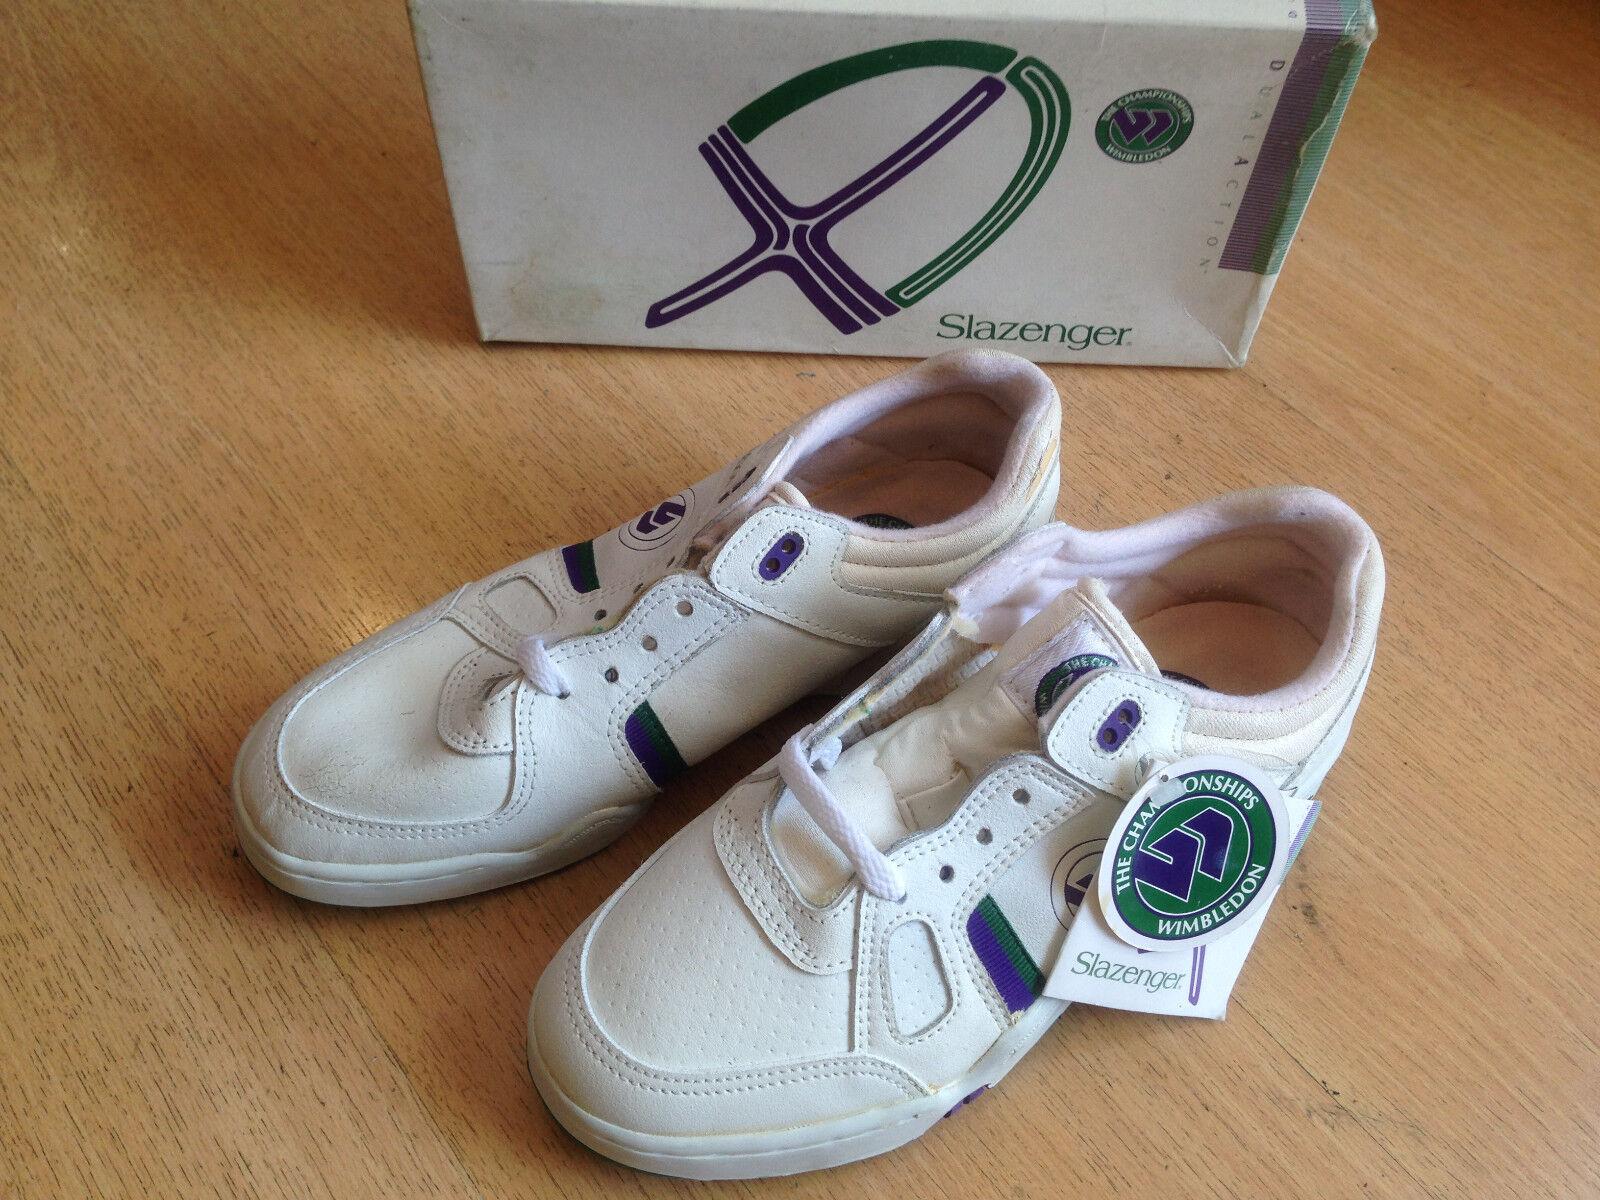 OG 1990 Slazenger Wimbledon vintage scarpe da ginnastica size US7.5 UK5 EUR38 VERY RARE!!